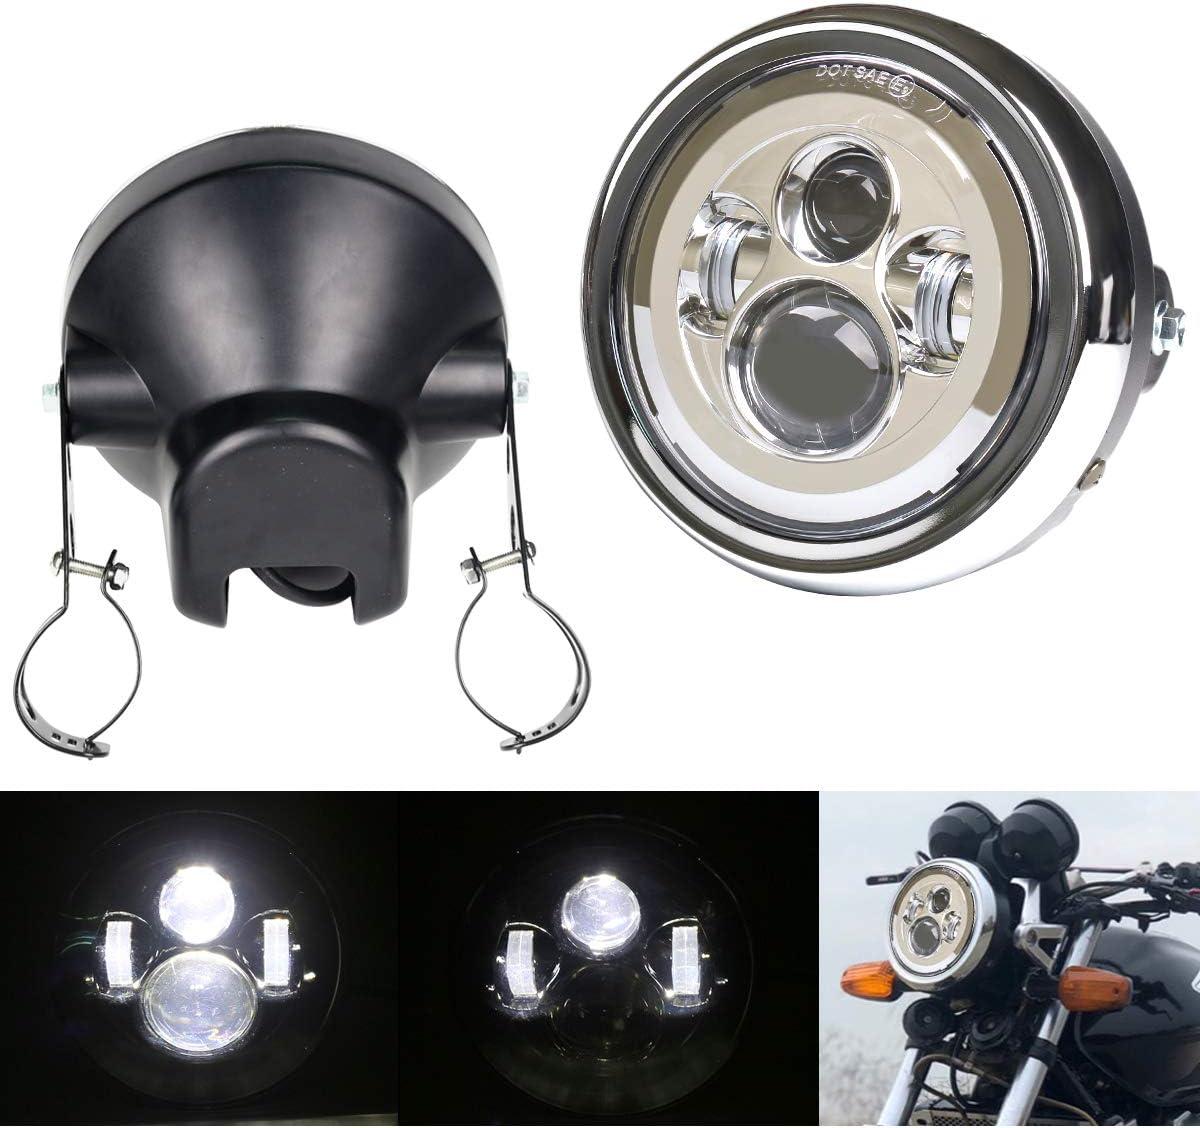 DDUOO 7inch Chrome Motorcycle Headlight with セール開催中最短即日発送 Headligh 送料無料 一部地域を除く